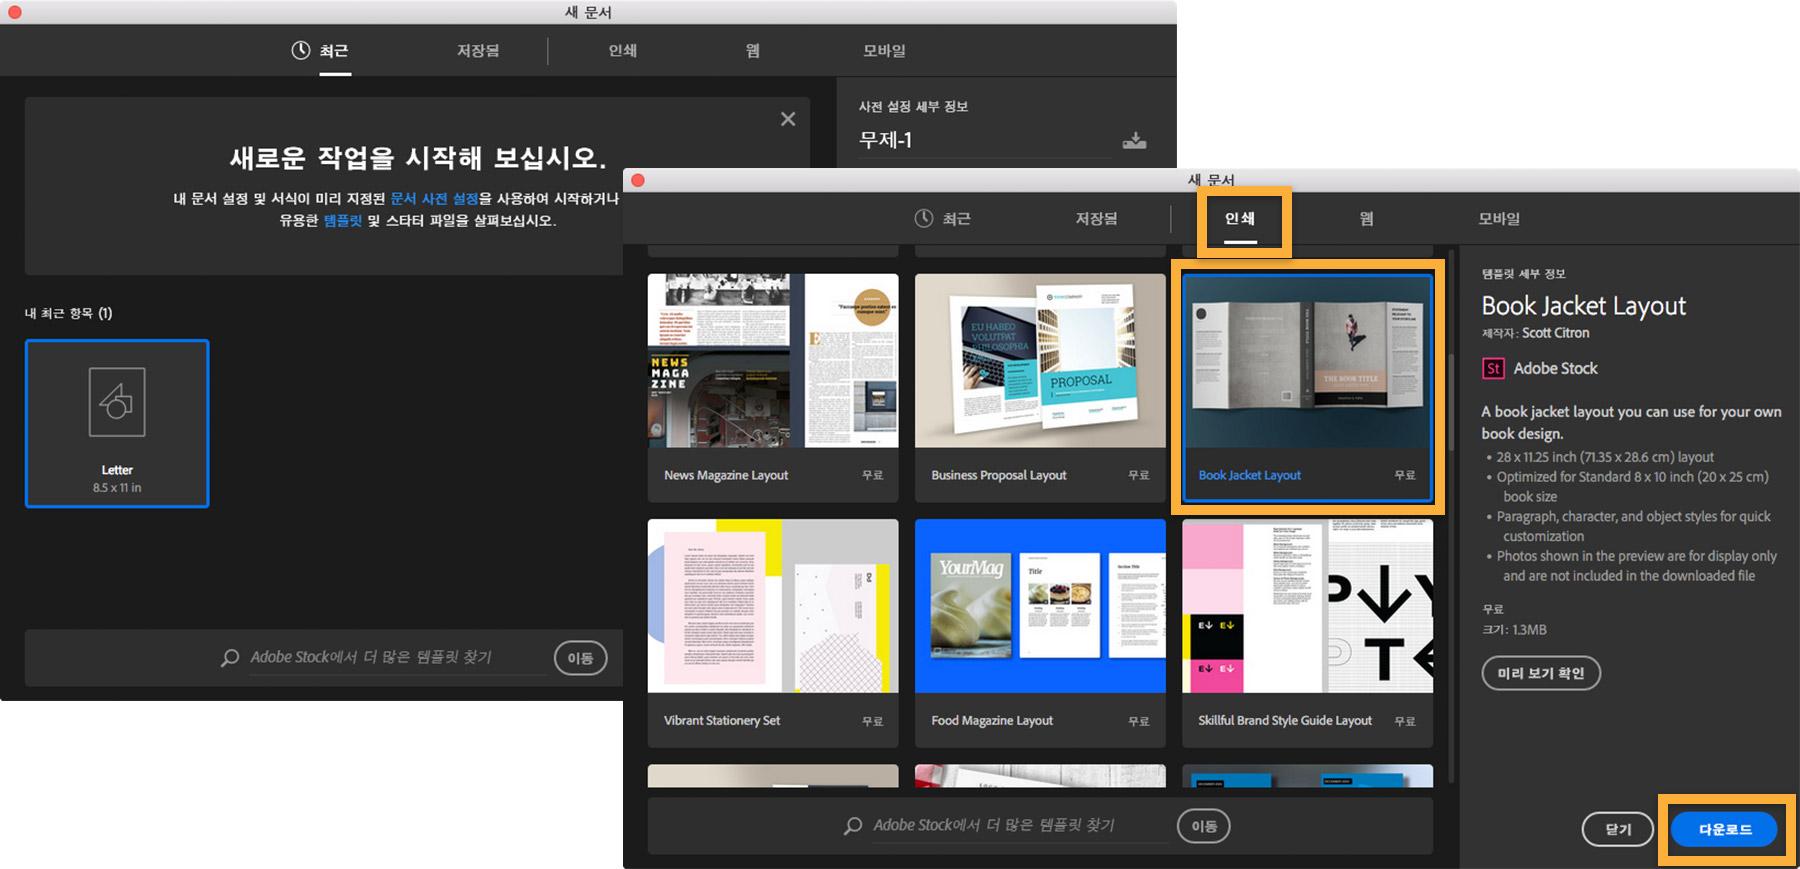 Book Cover Design Software : 책 표지를 디자인하는 방법 adobe stock 자습서